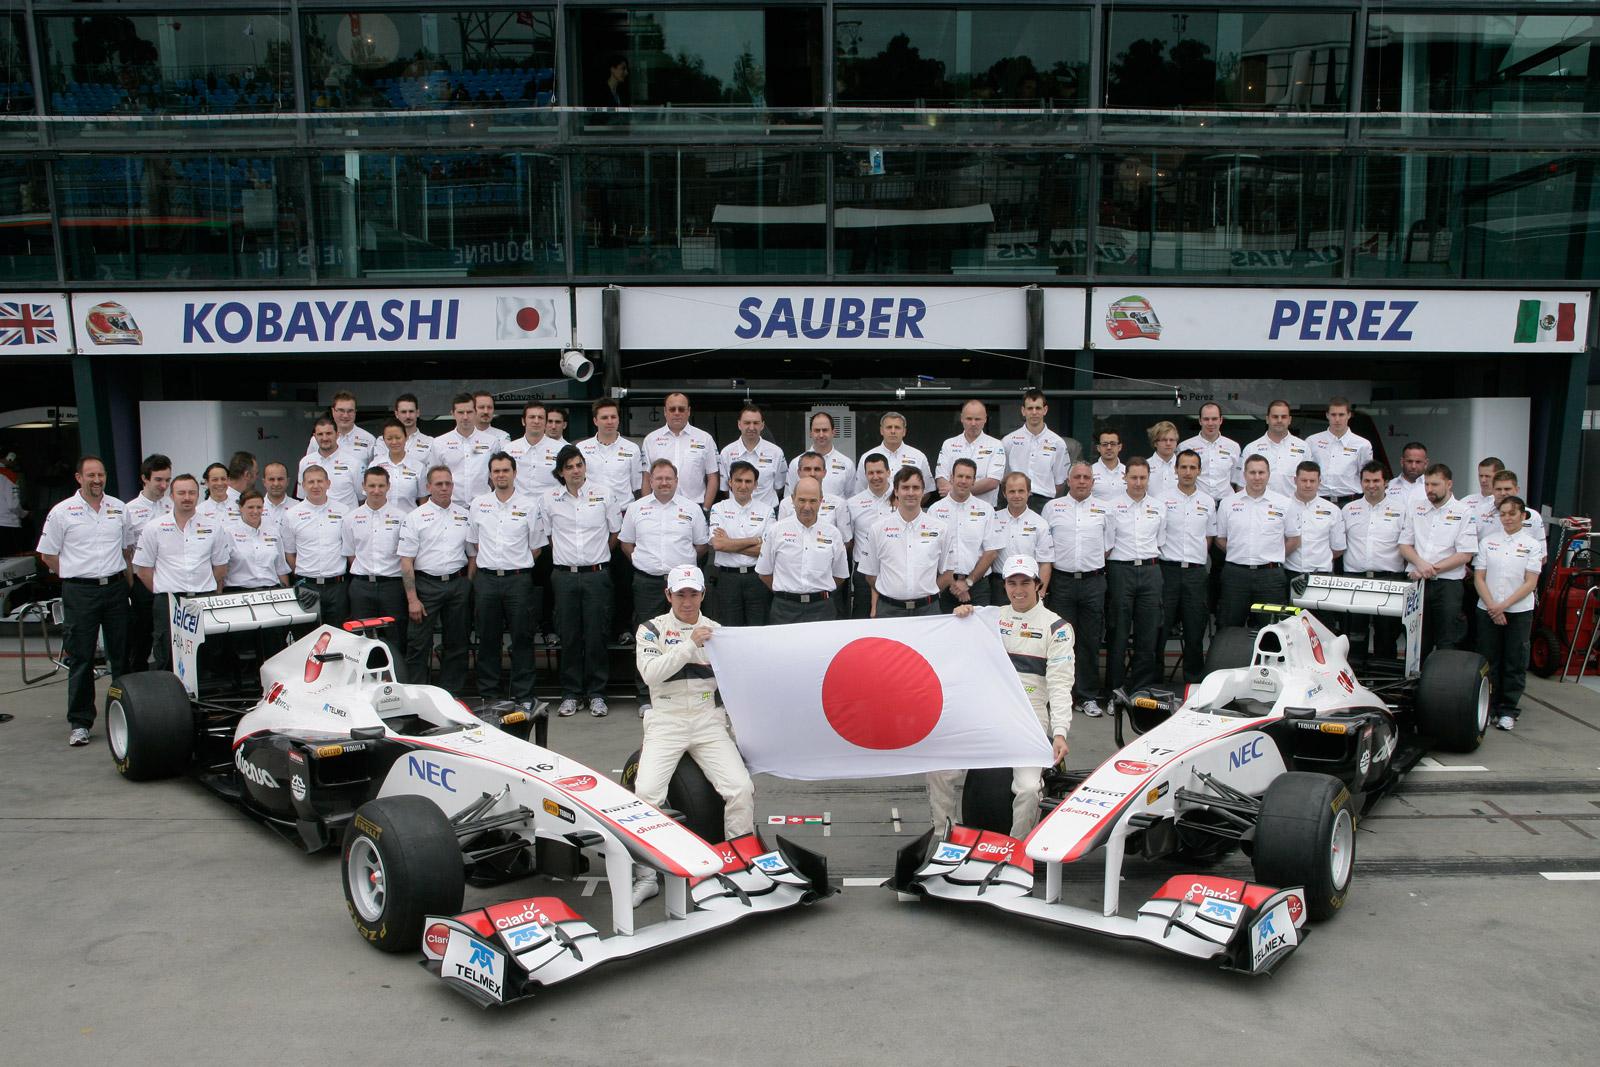 вся команда Sauber на фоне боксов с японским флагом на Гран-при Австралии 2011